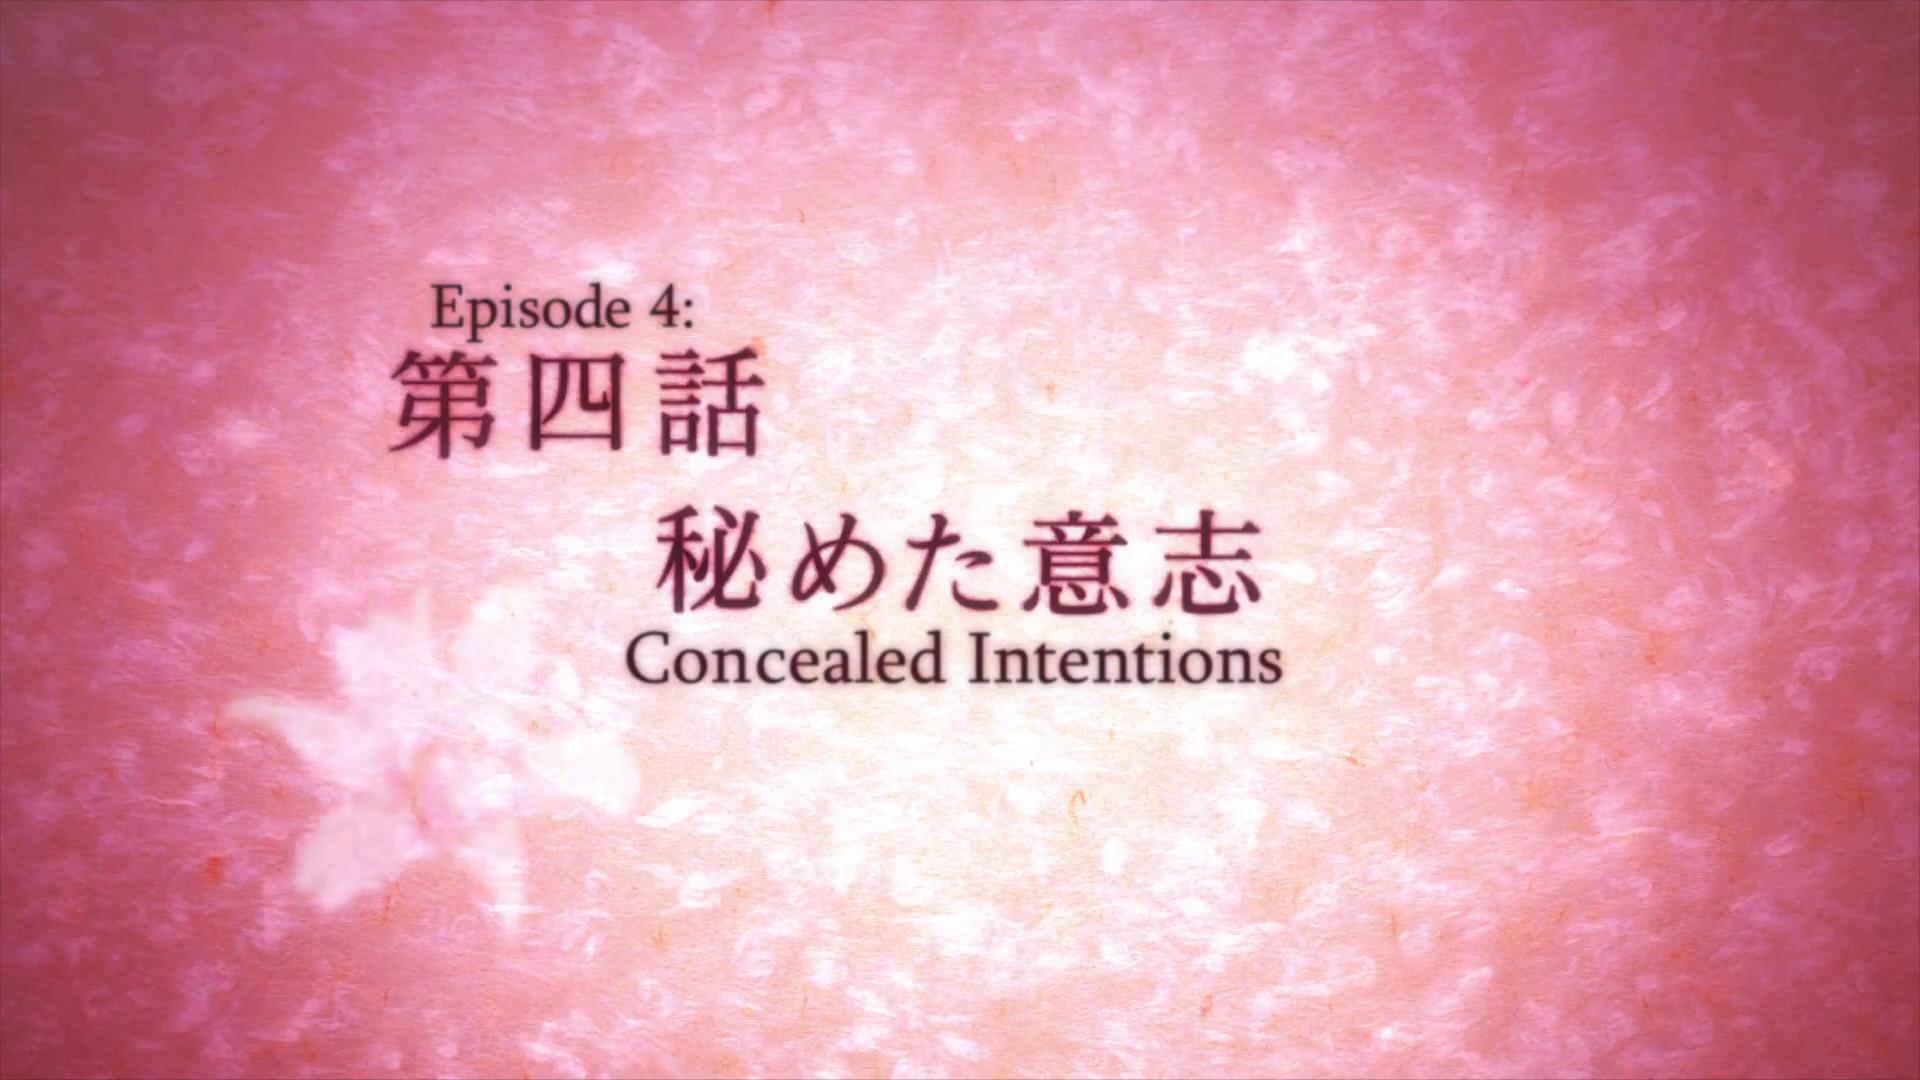 Yuki Yuna Is A Hero S2 Episode 11 Yuki Yuna Is A Hero Wiki Fandom